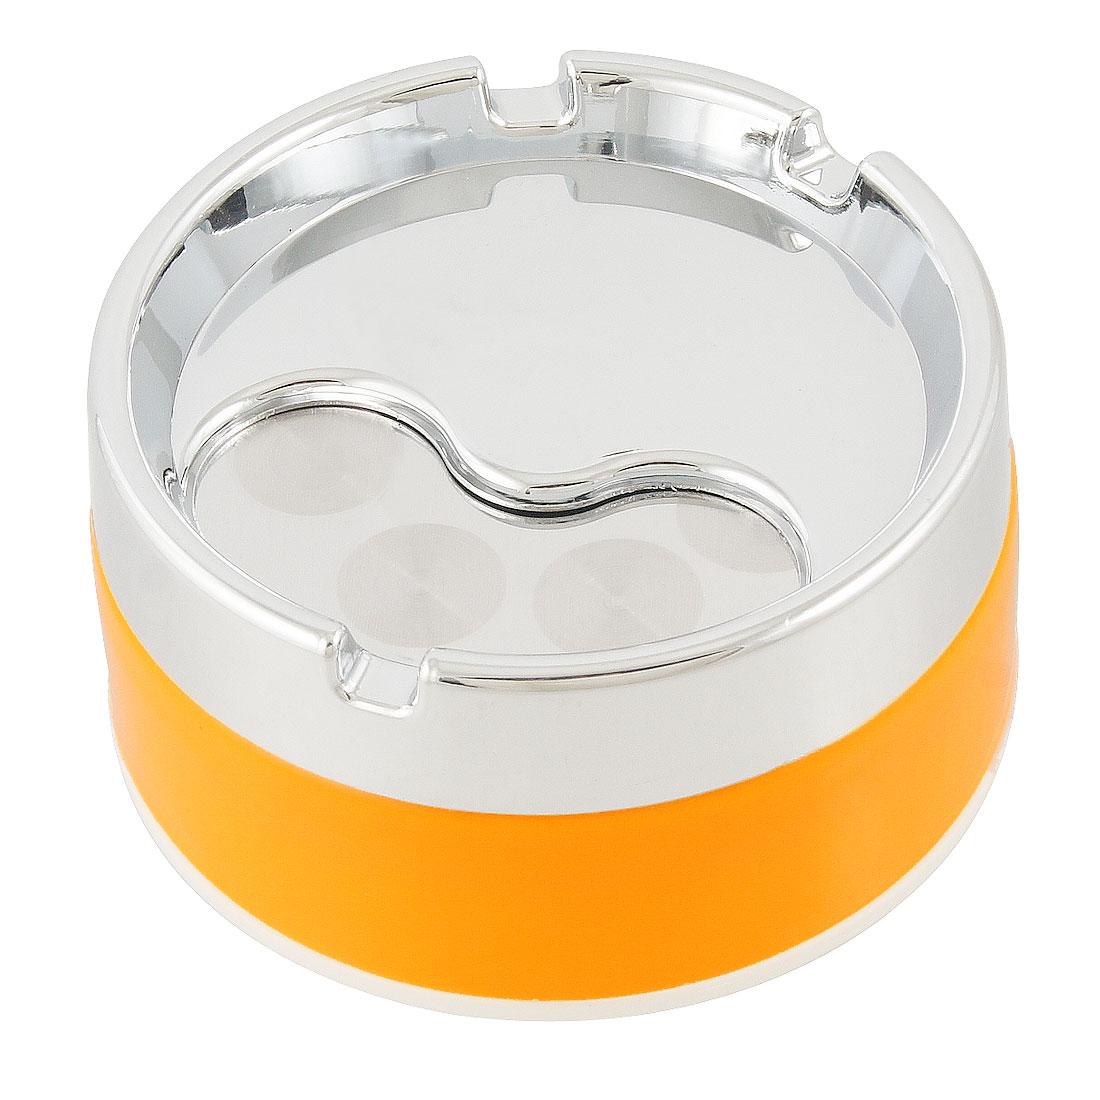 "Rotatable Cover 3.3"" Dia Round Cigarette Smoking Ashtray Holder Orange"